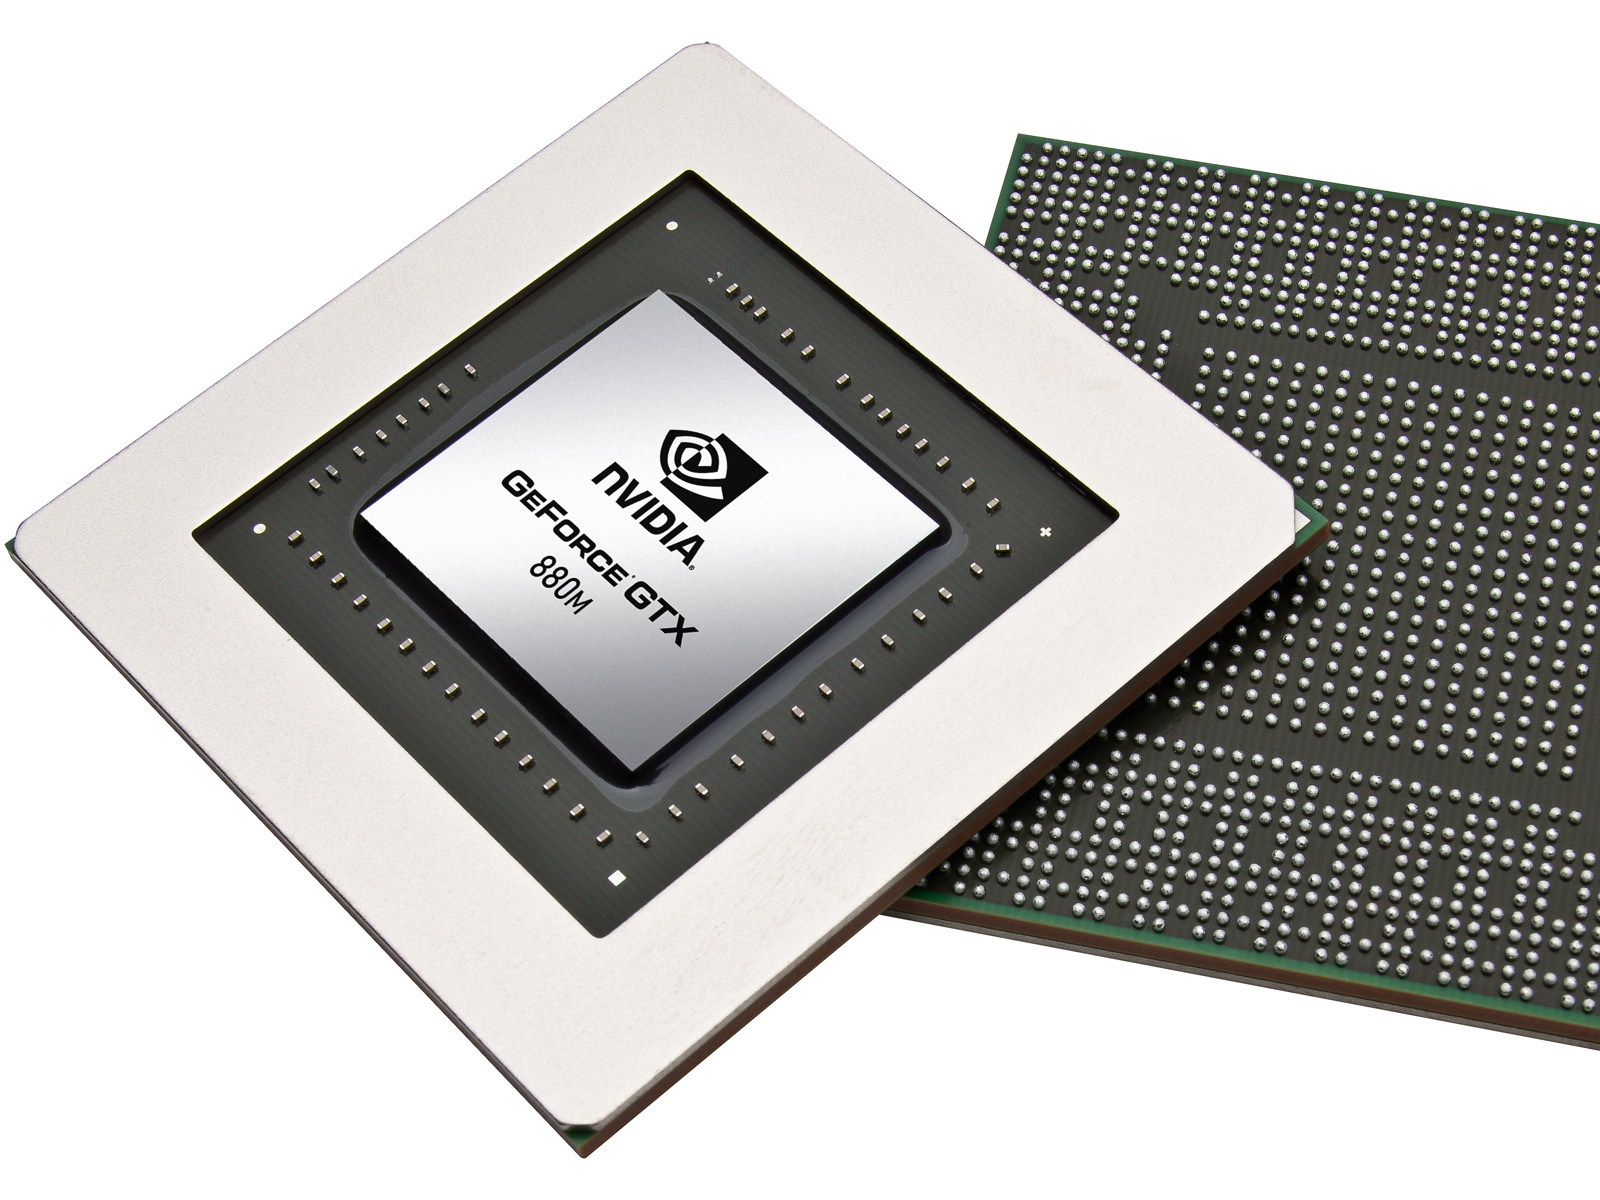 NVIDIA 860M DRIVERS FOR WINDOWS XP